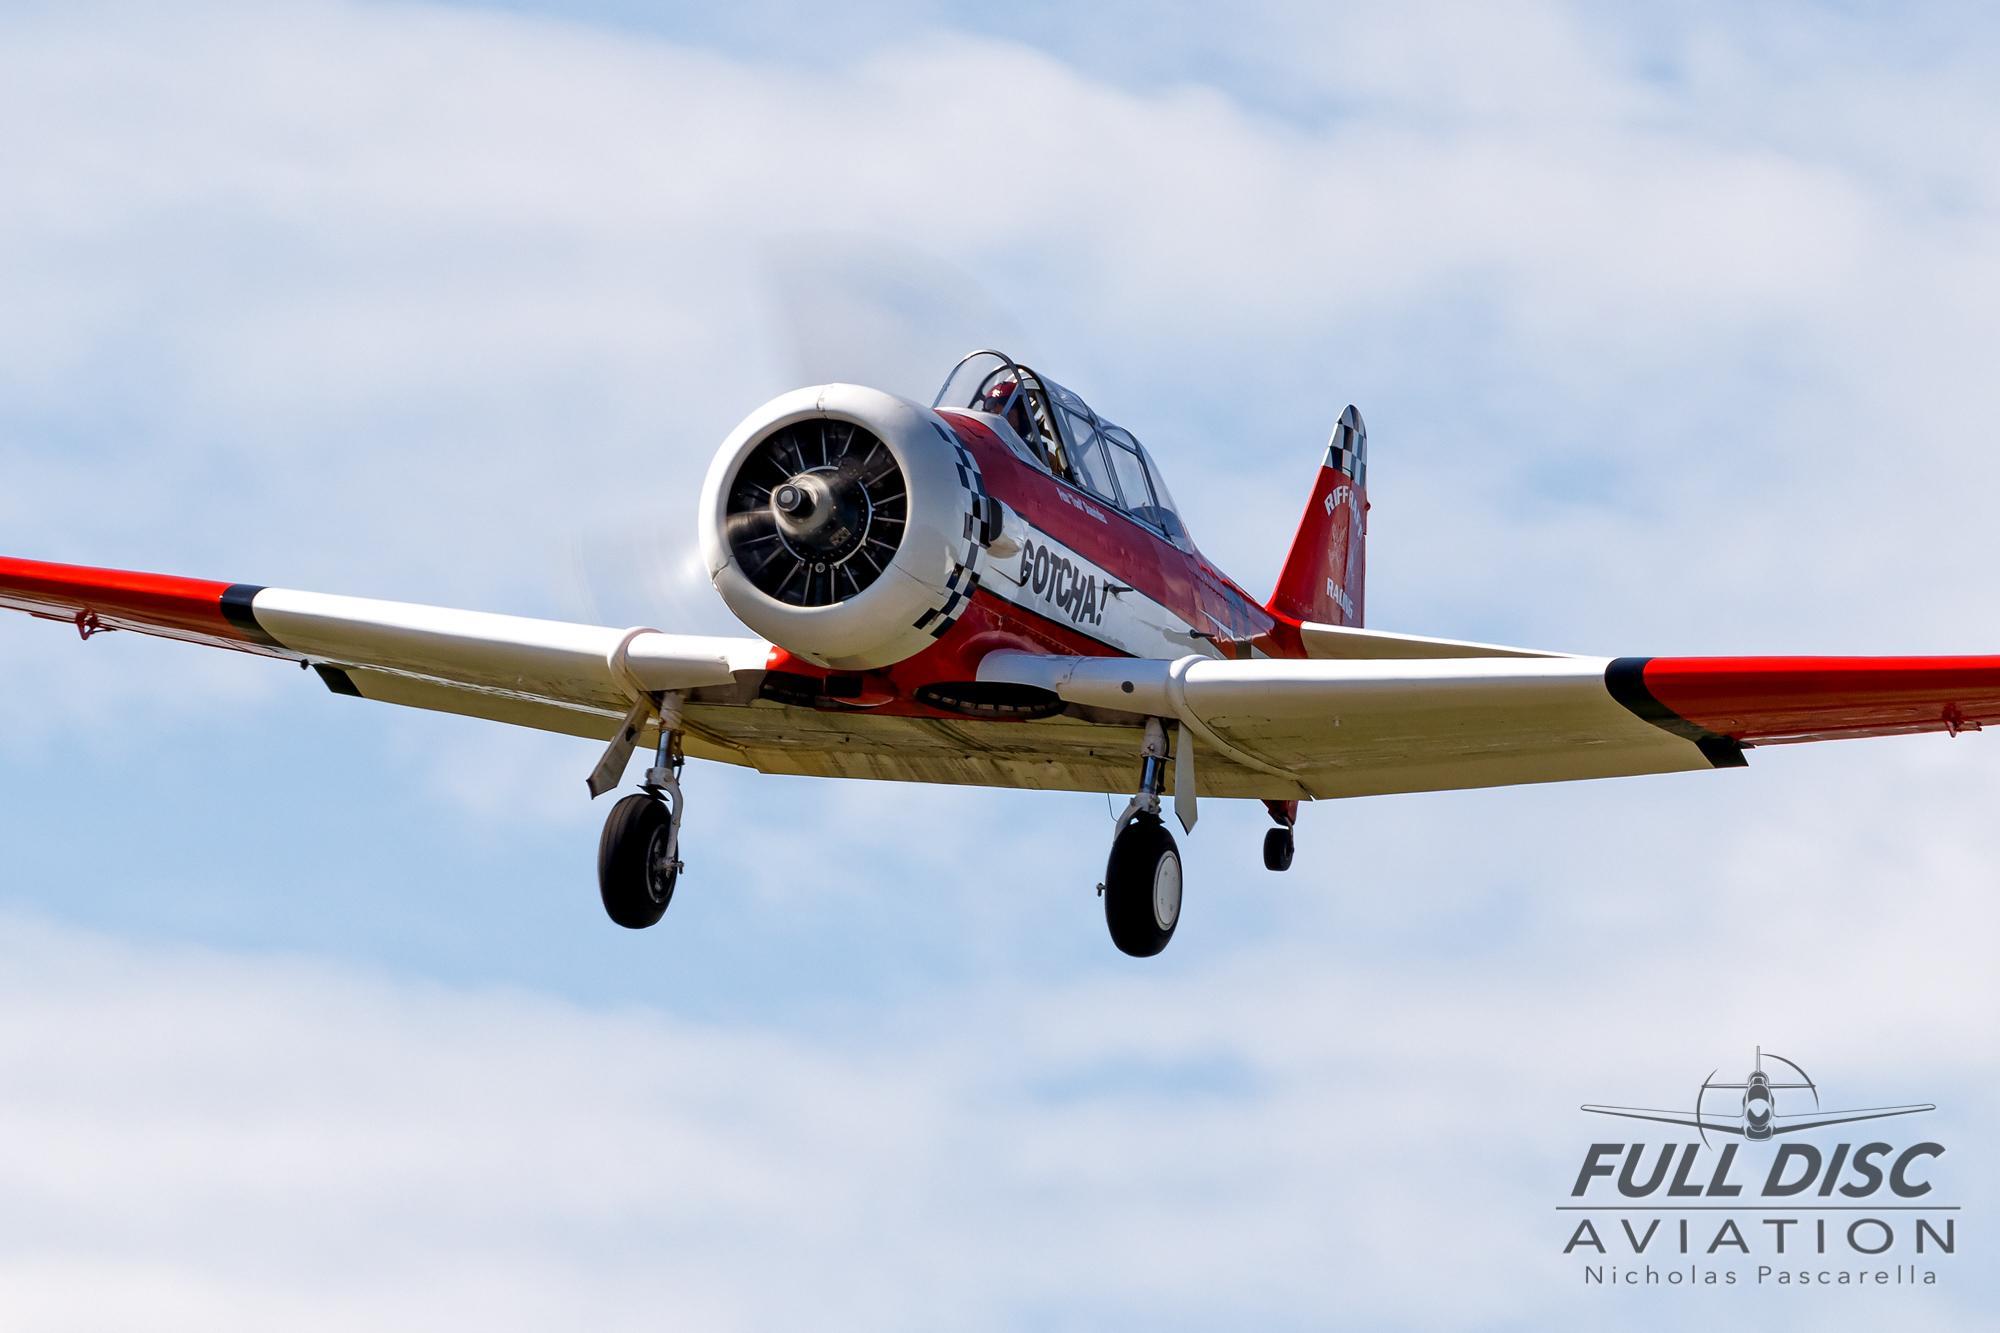 americanairpowermuseum_nicholaspascarella_nickpascarella_fulldiscaviation_legendsofairpower2019_aviation_warbird_gotcha_t6texan_riffraffracing.jpg